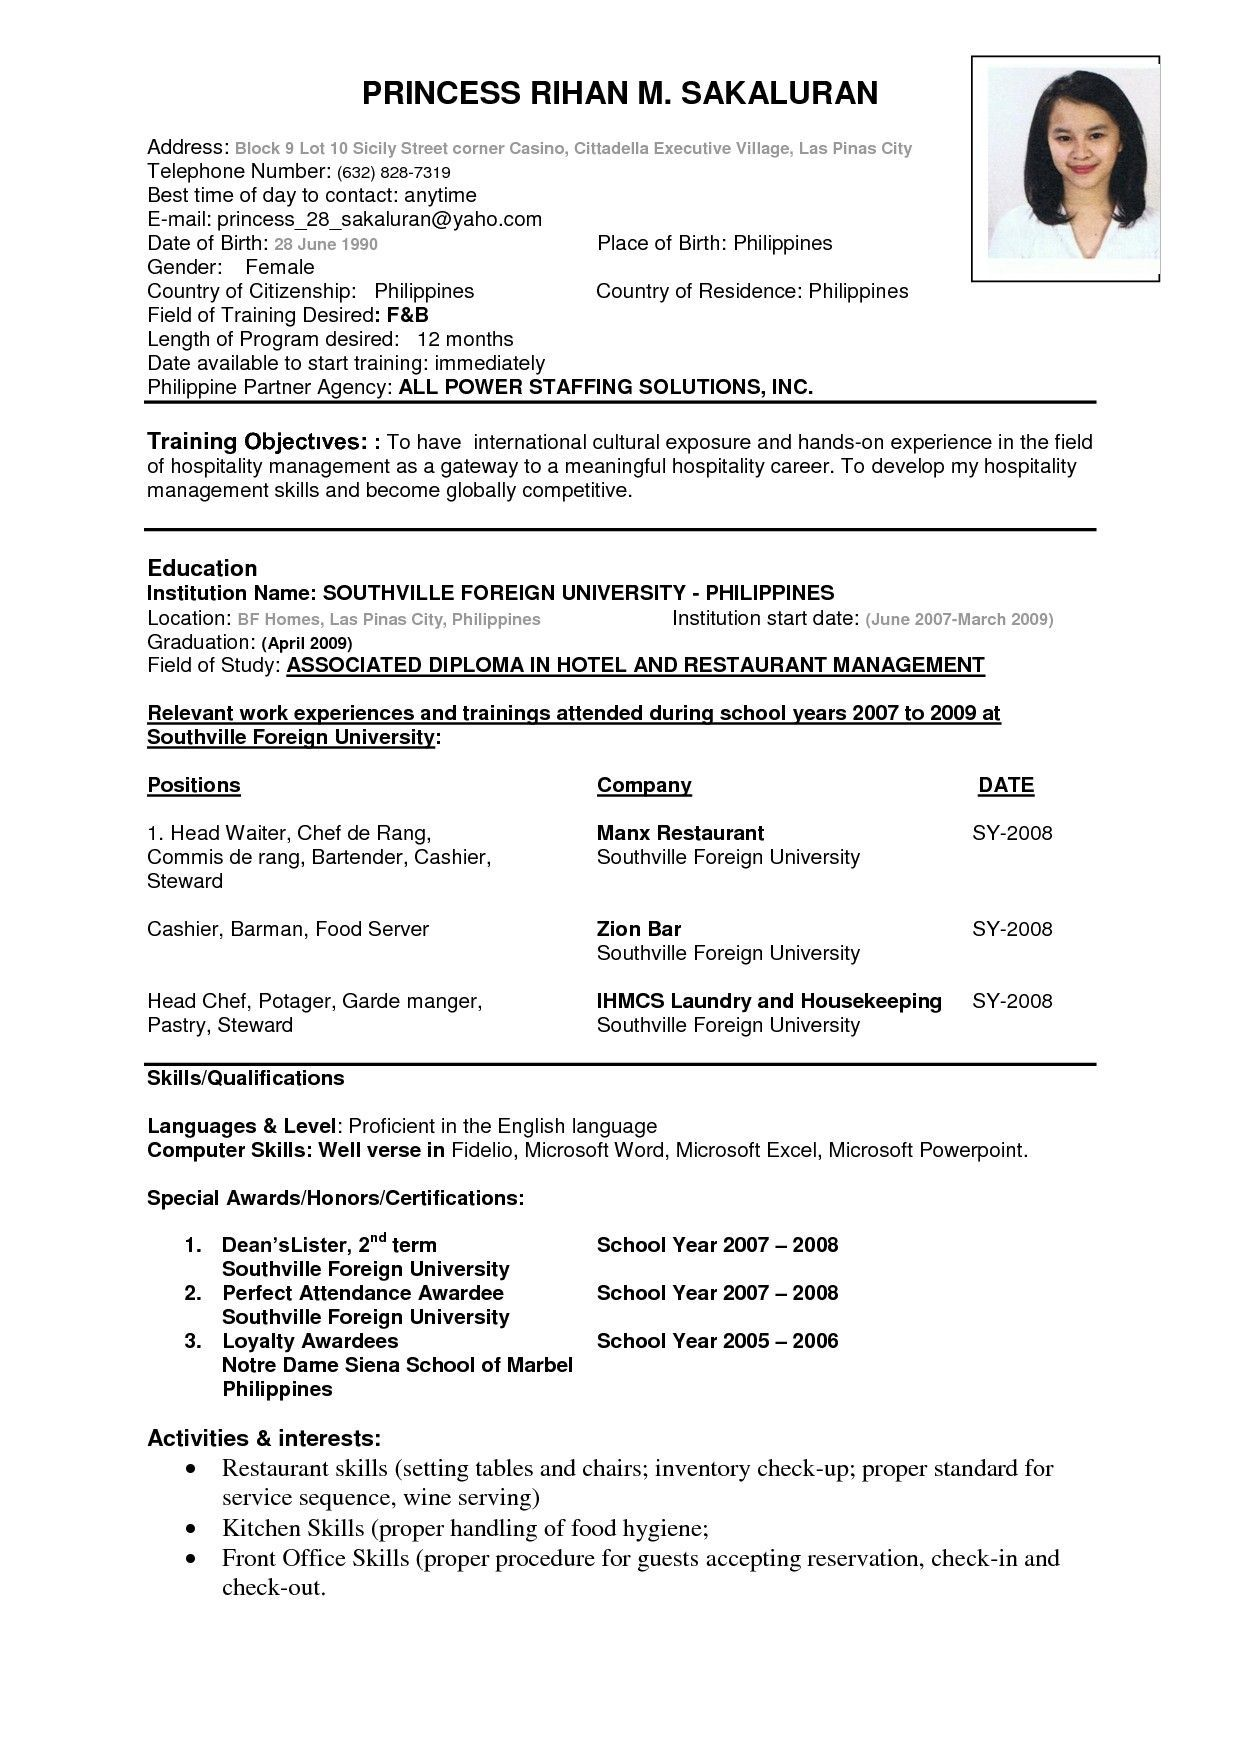 Resume Format Checker Resume format examples, Job resume